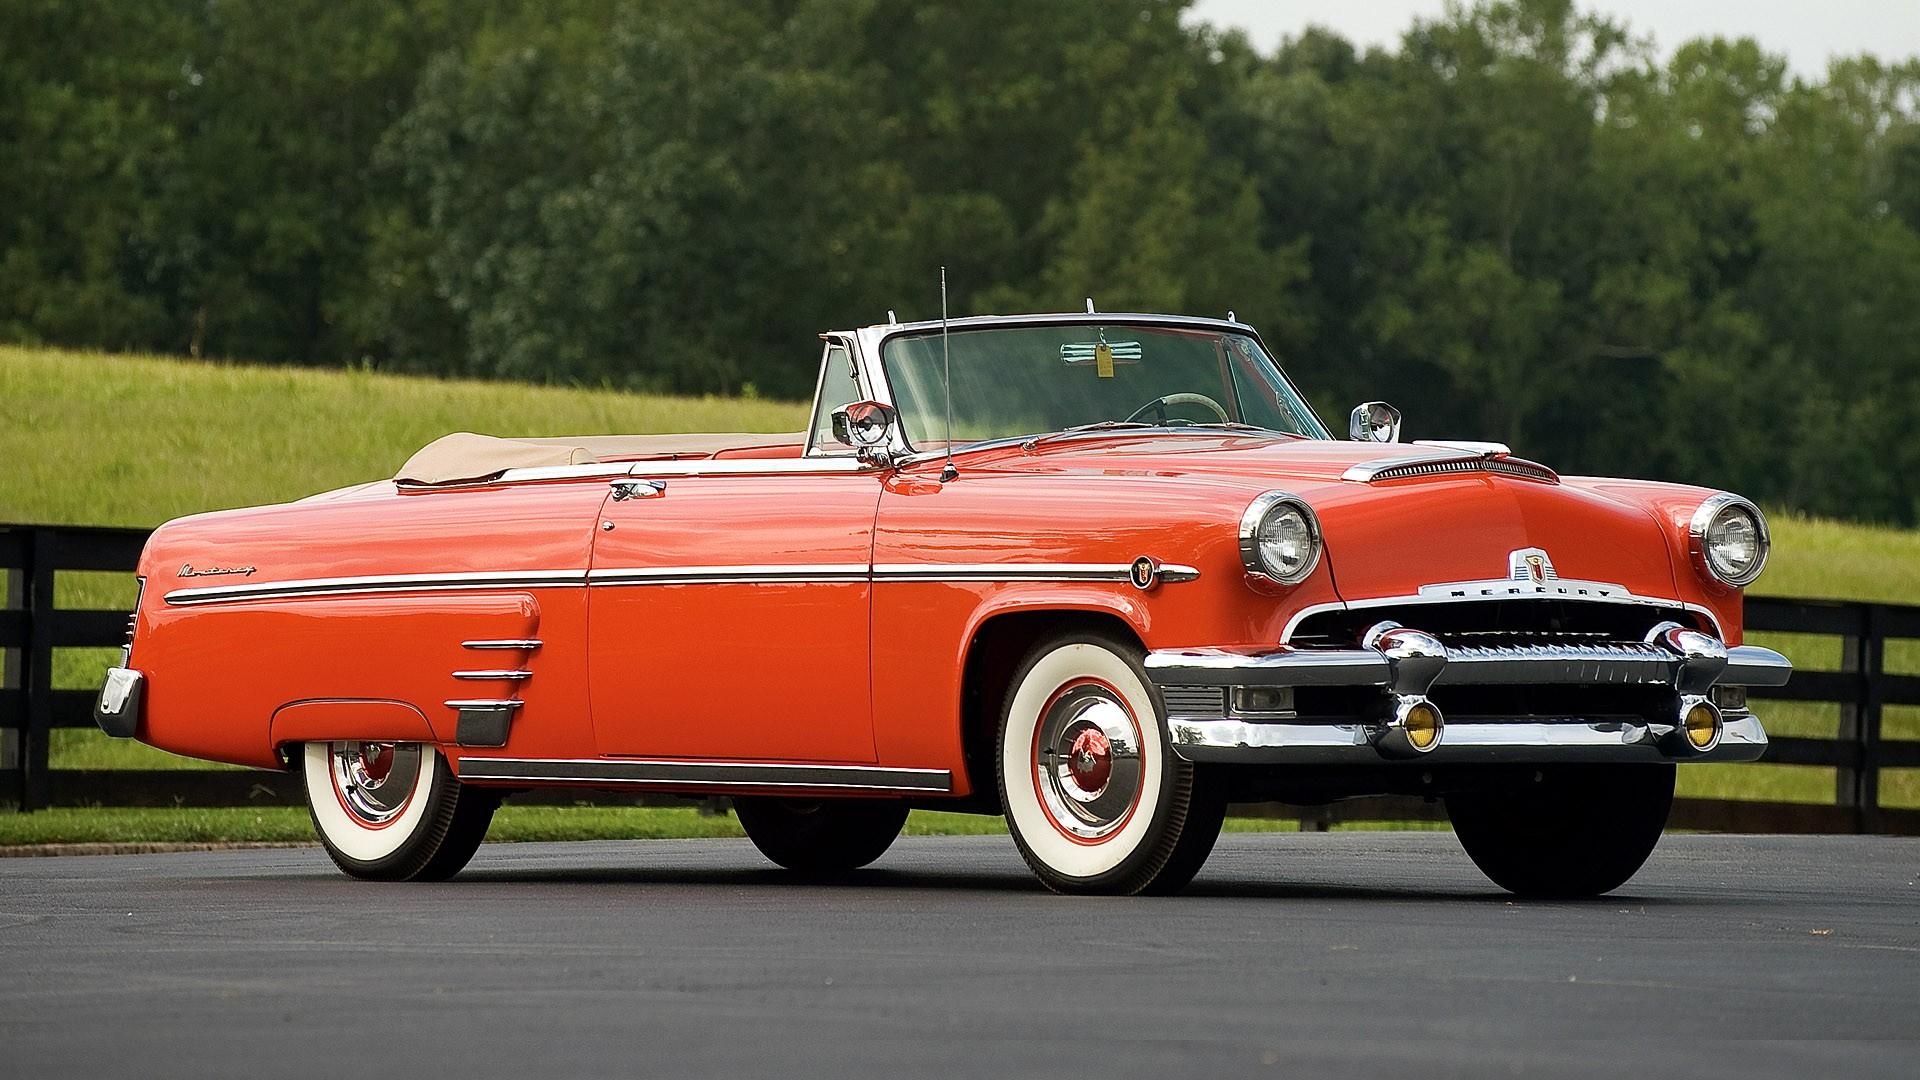 Free Classic Car Wallpapers Vintage Wallpaper Classic Car 1290678 Hd Wallpaper Backgrounds Download